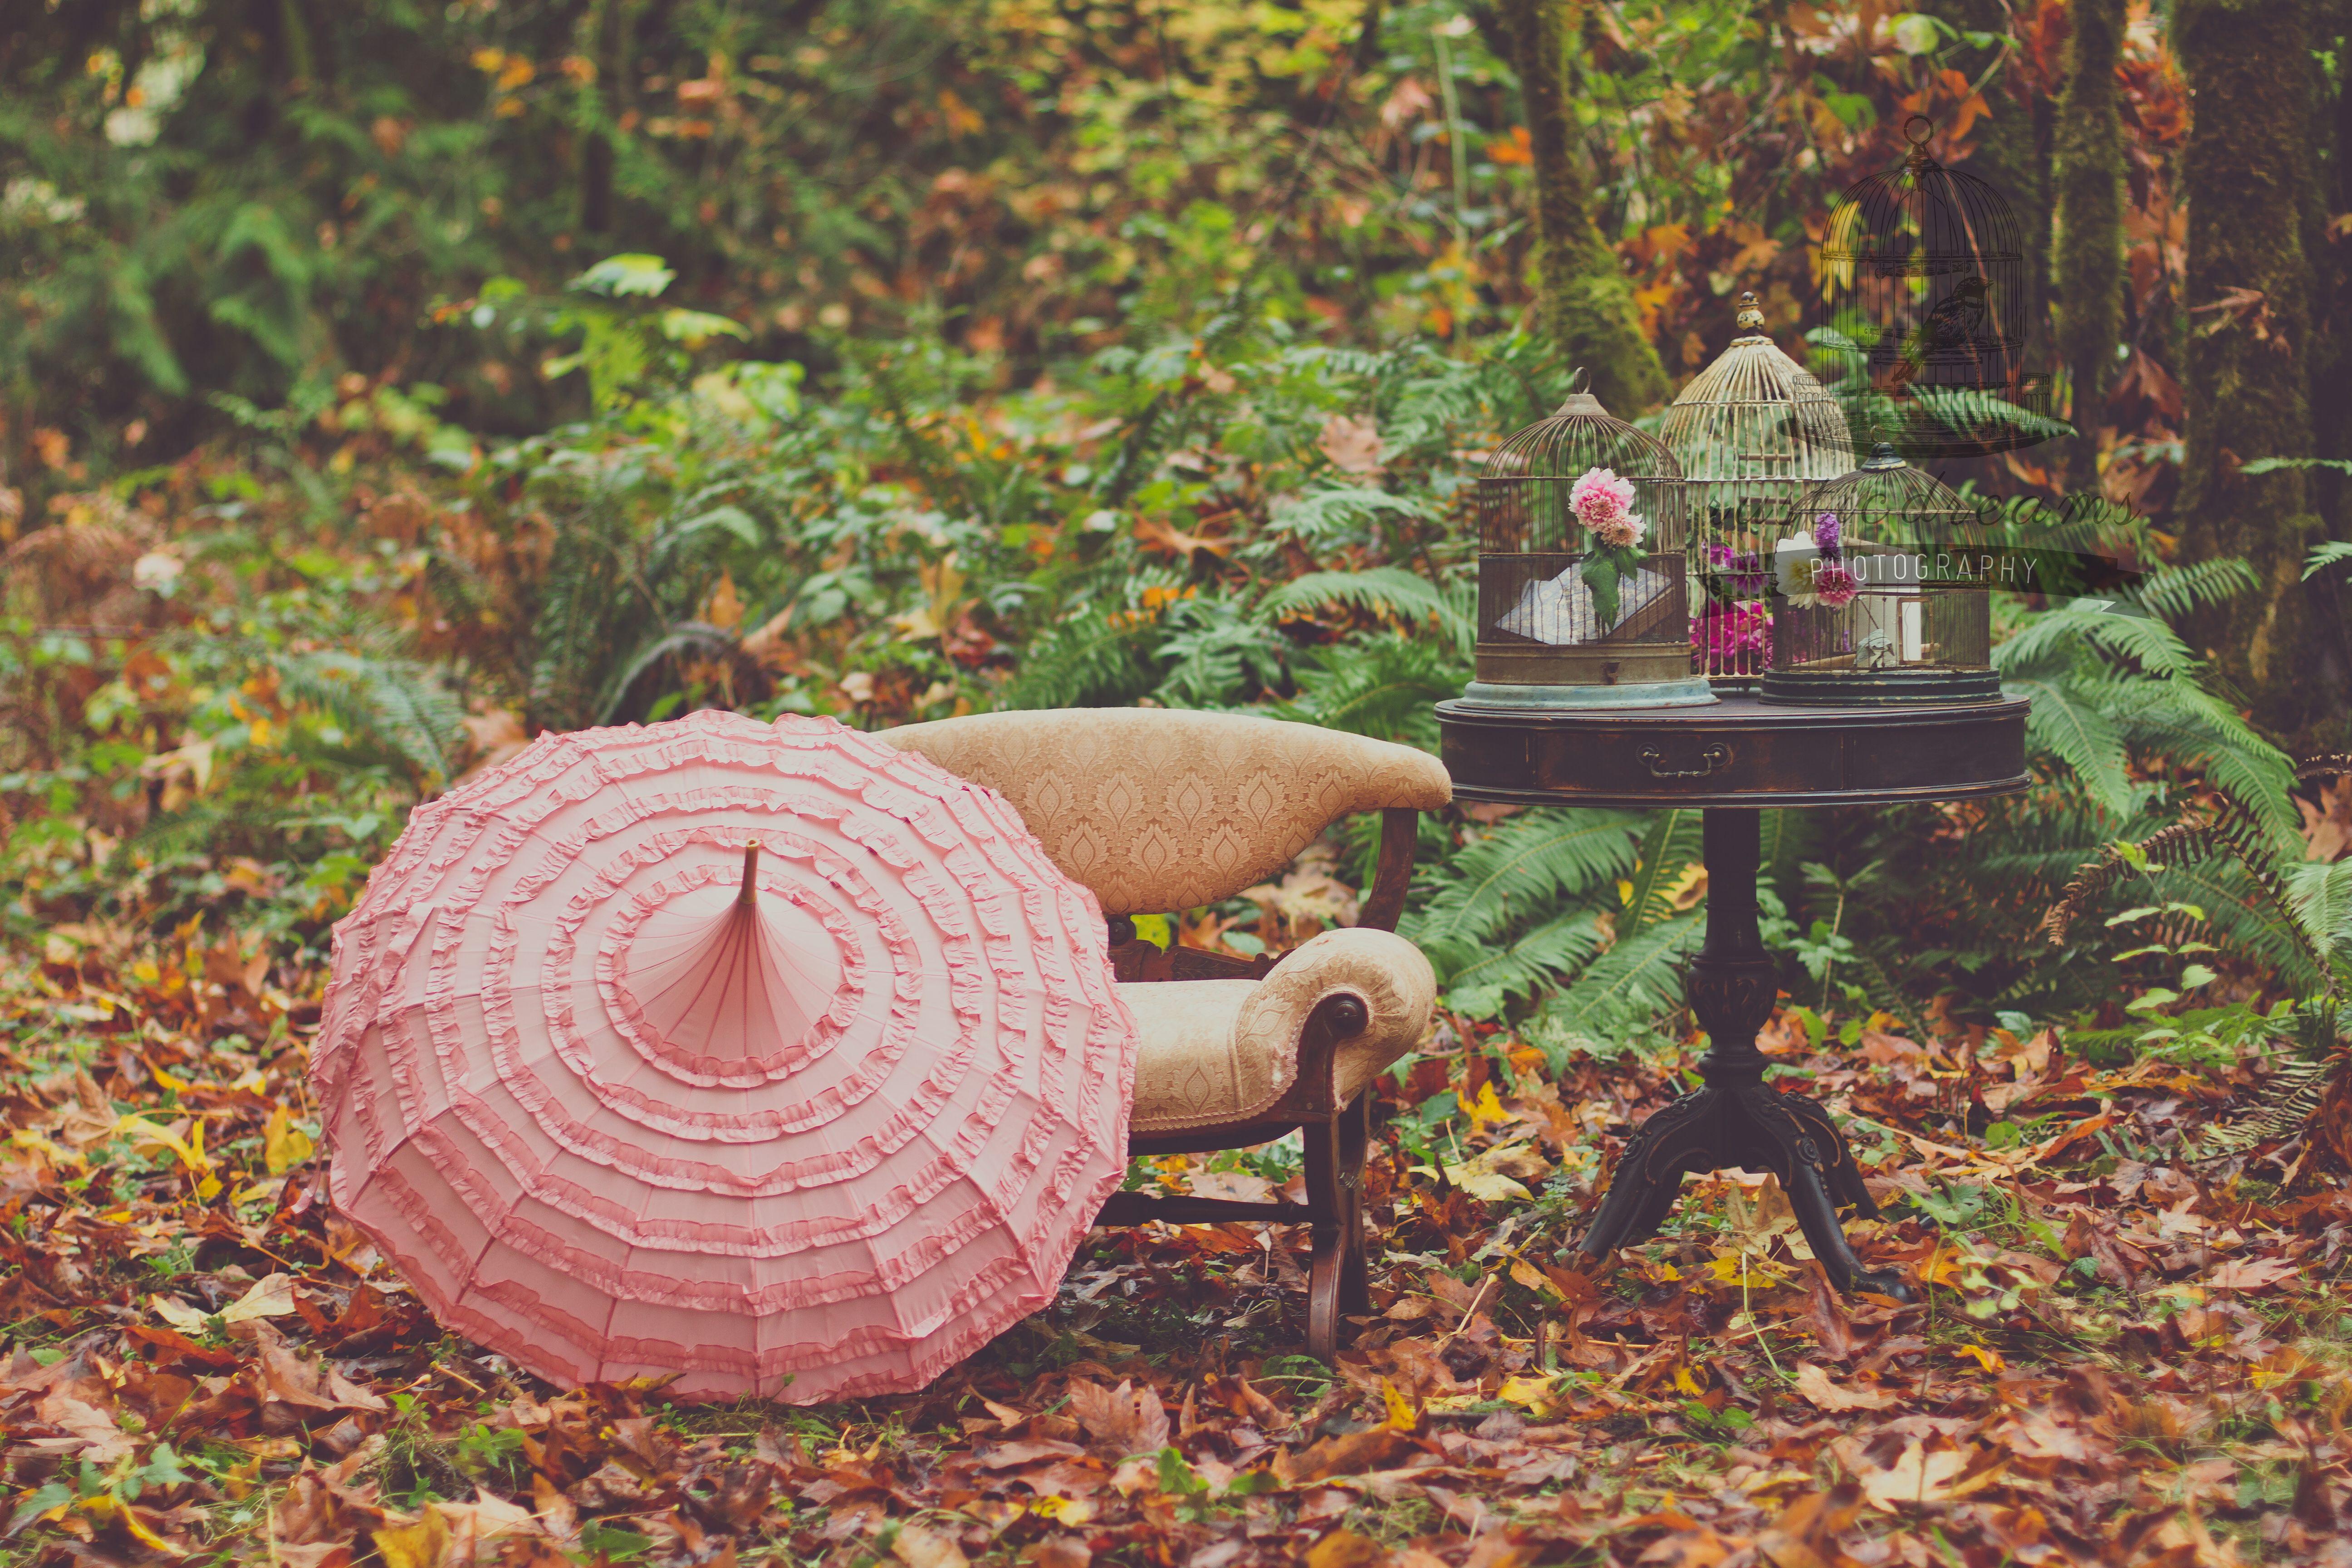 Bella Umbrella Blog - Under the Umbrella - Birdcages & Misty Forests PhotoShoot